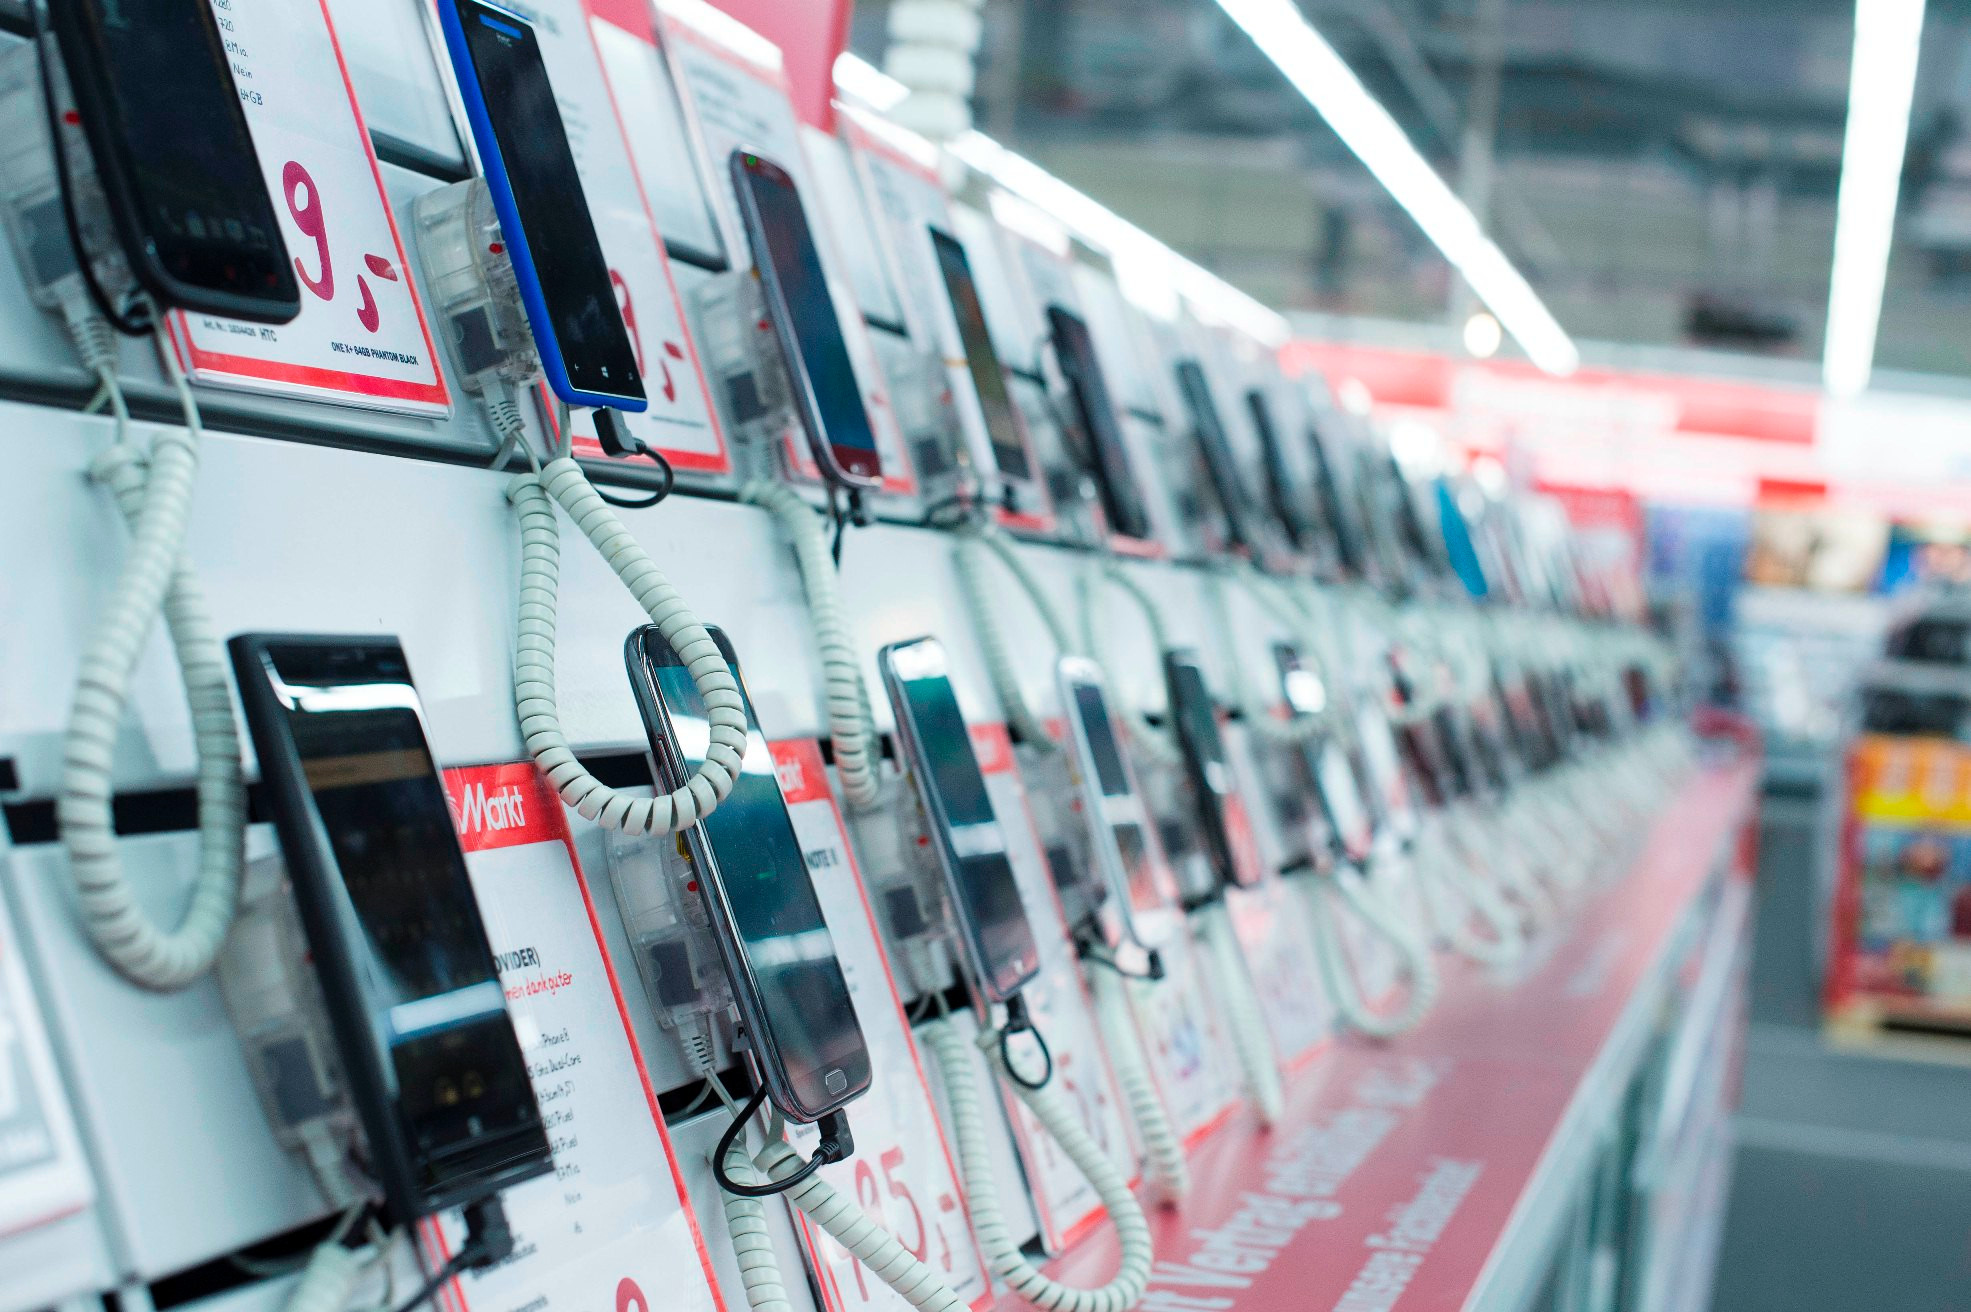 mediamarkt-smartphone